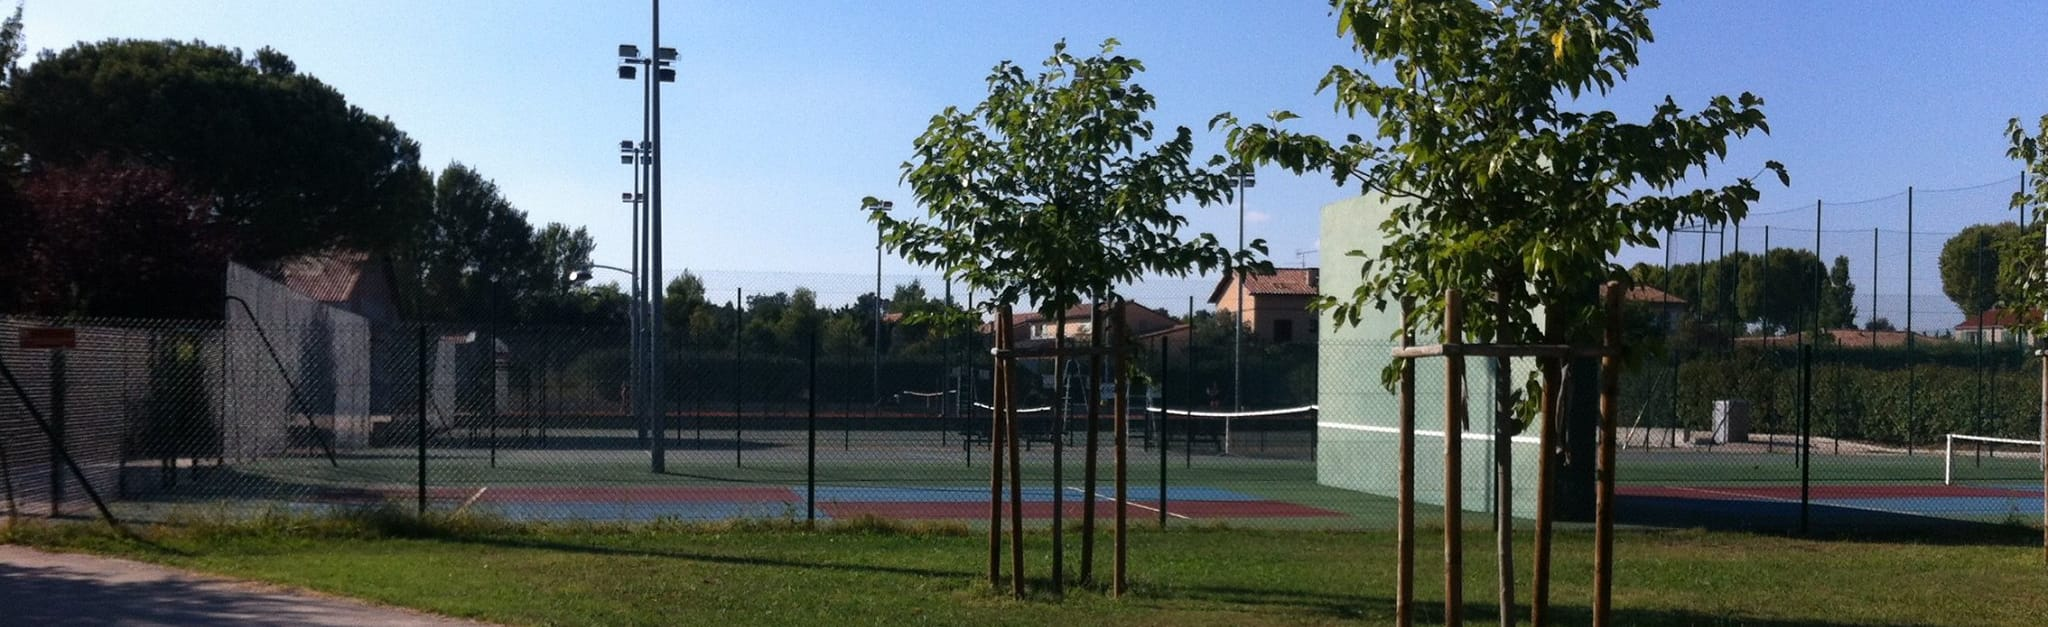 Cornebarrieu Tennis Club